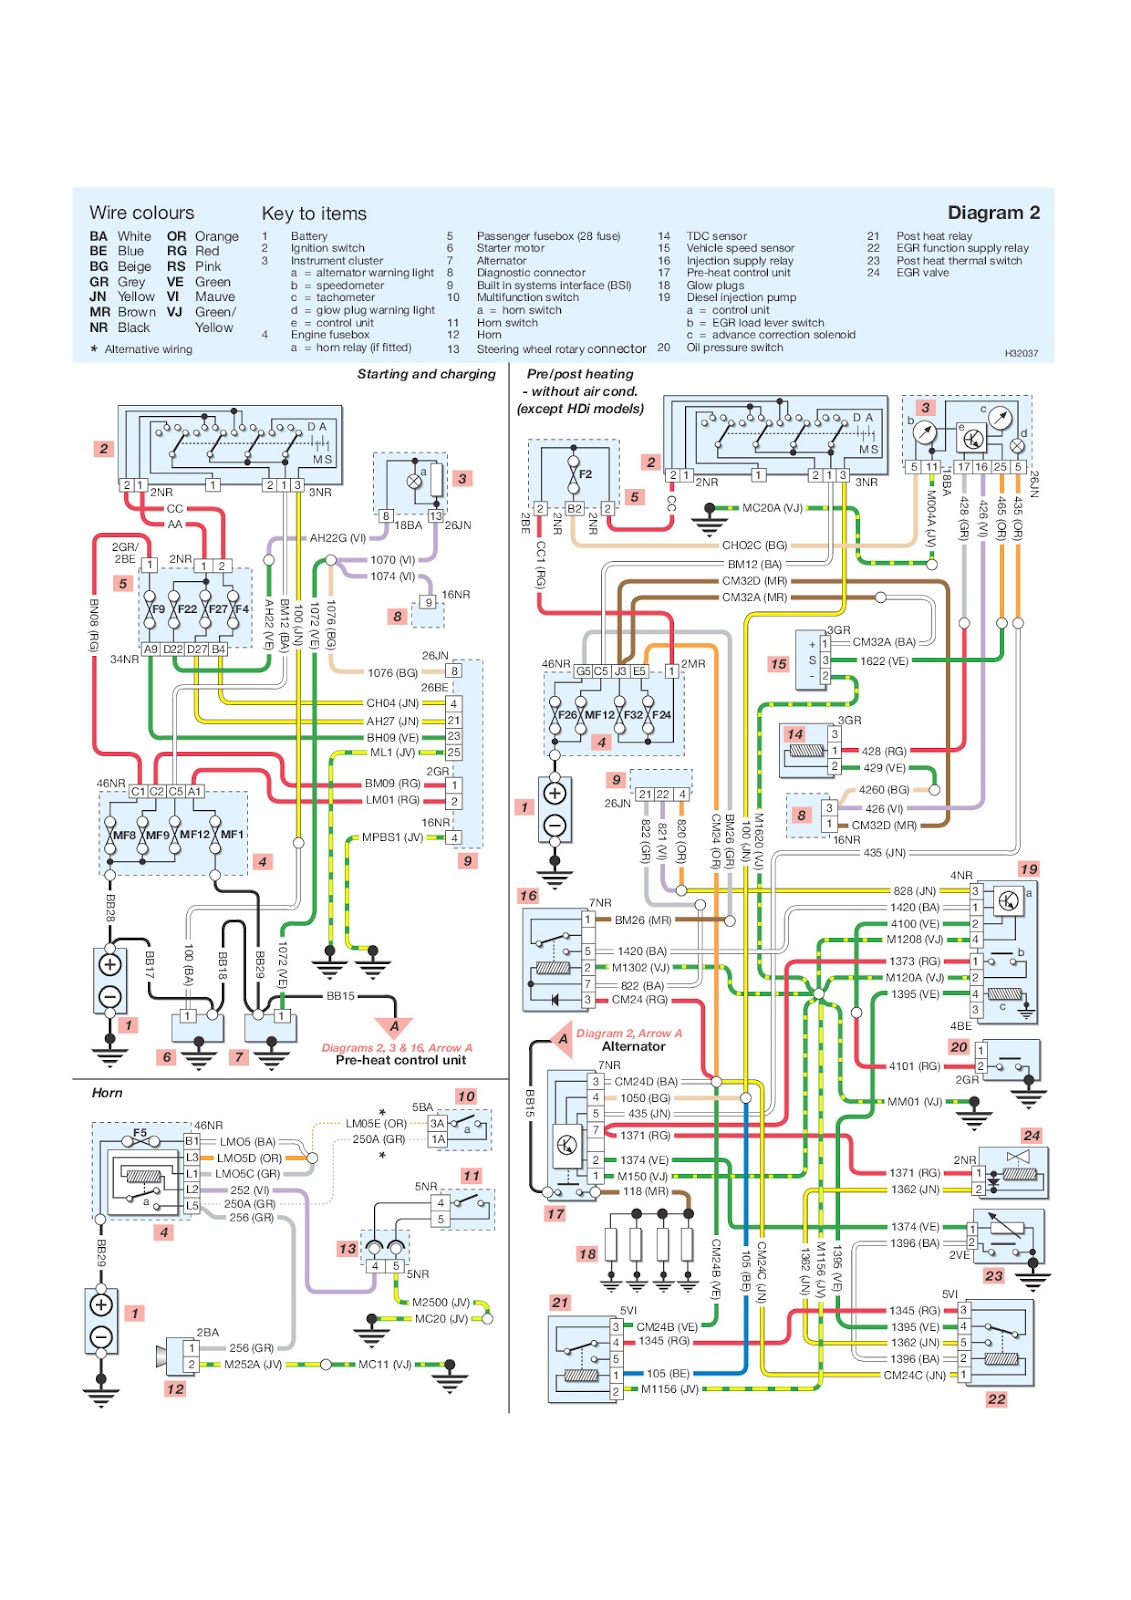 Your Wiring Diagrams Source: Peugeot 206 Starting, charging, horn, prepostheating Wiring Diagrams